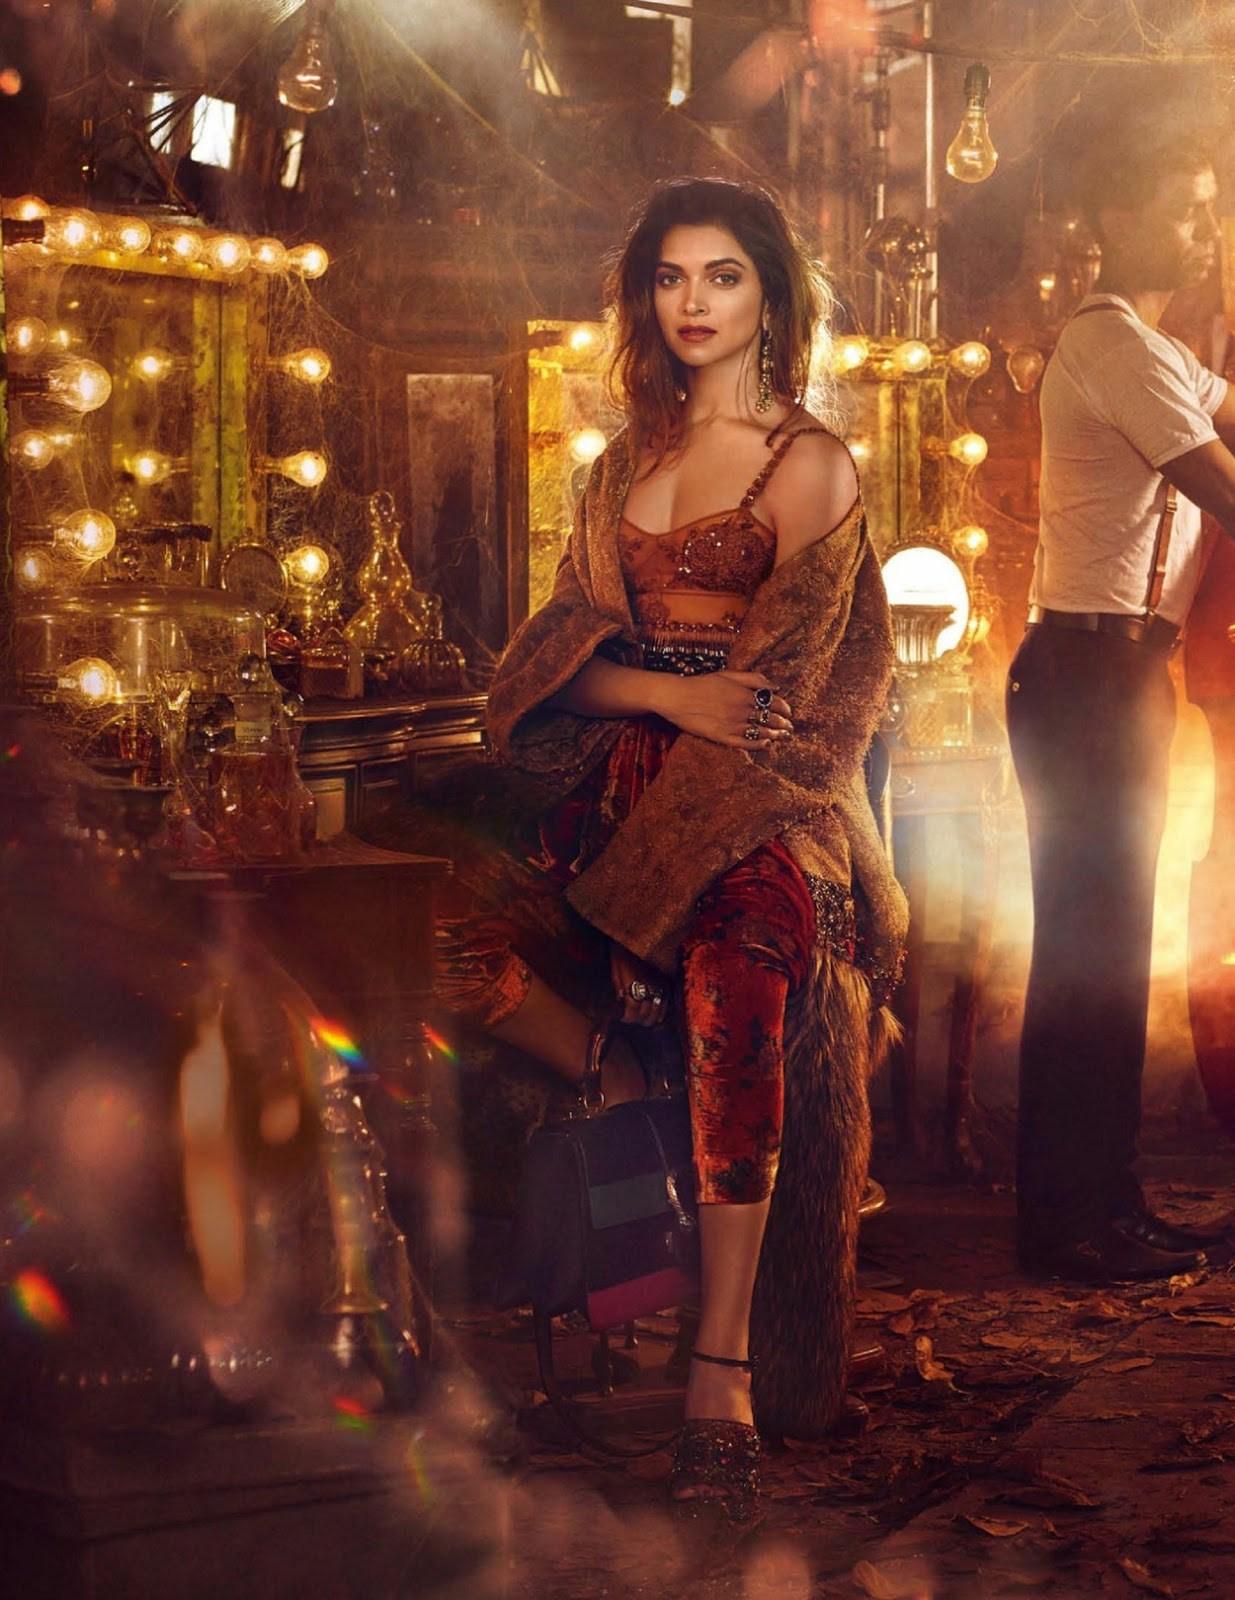 Deepika Padukone on Vogue India Magazine Cover November 2016 Issue 04